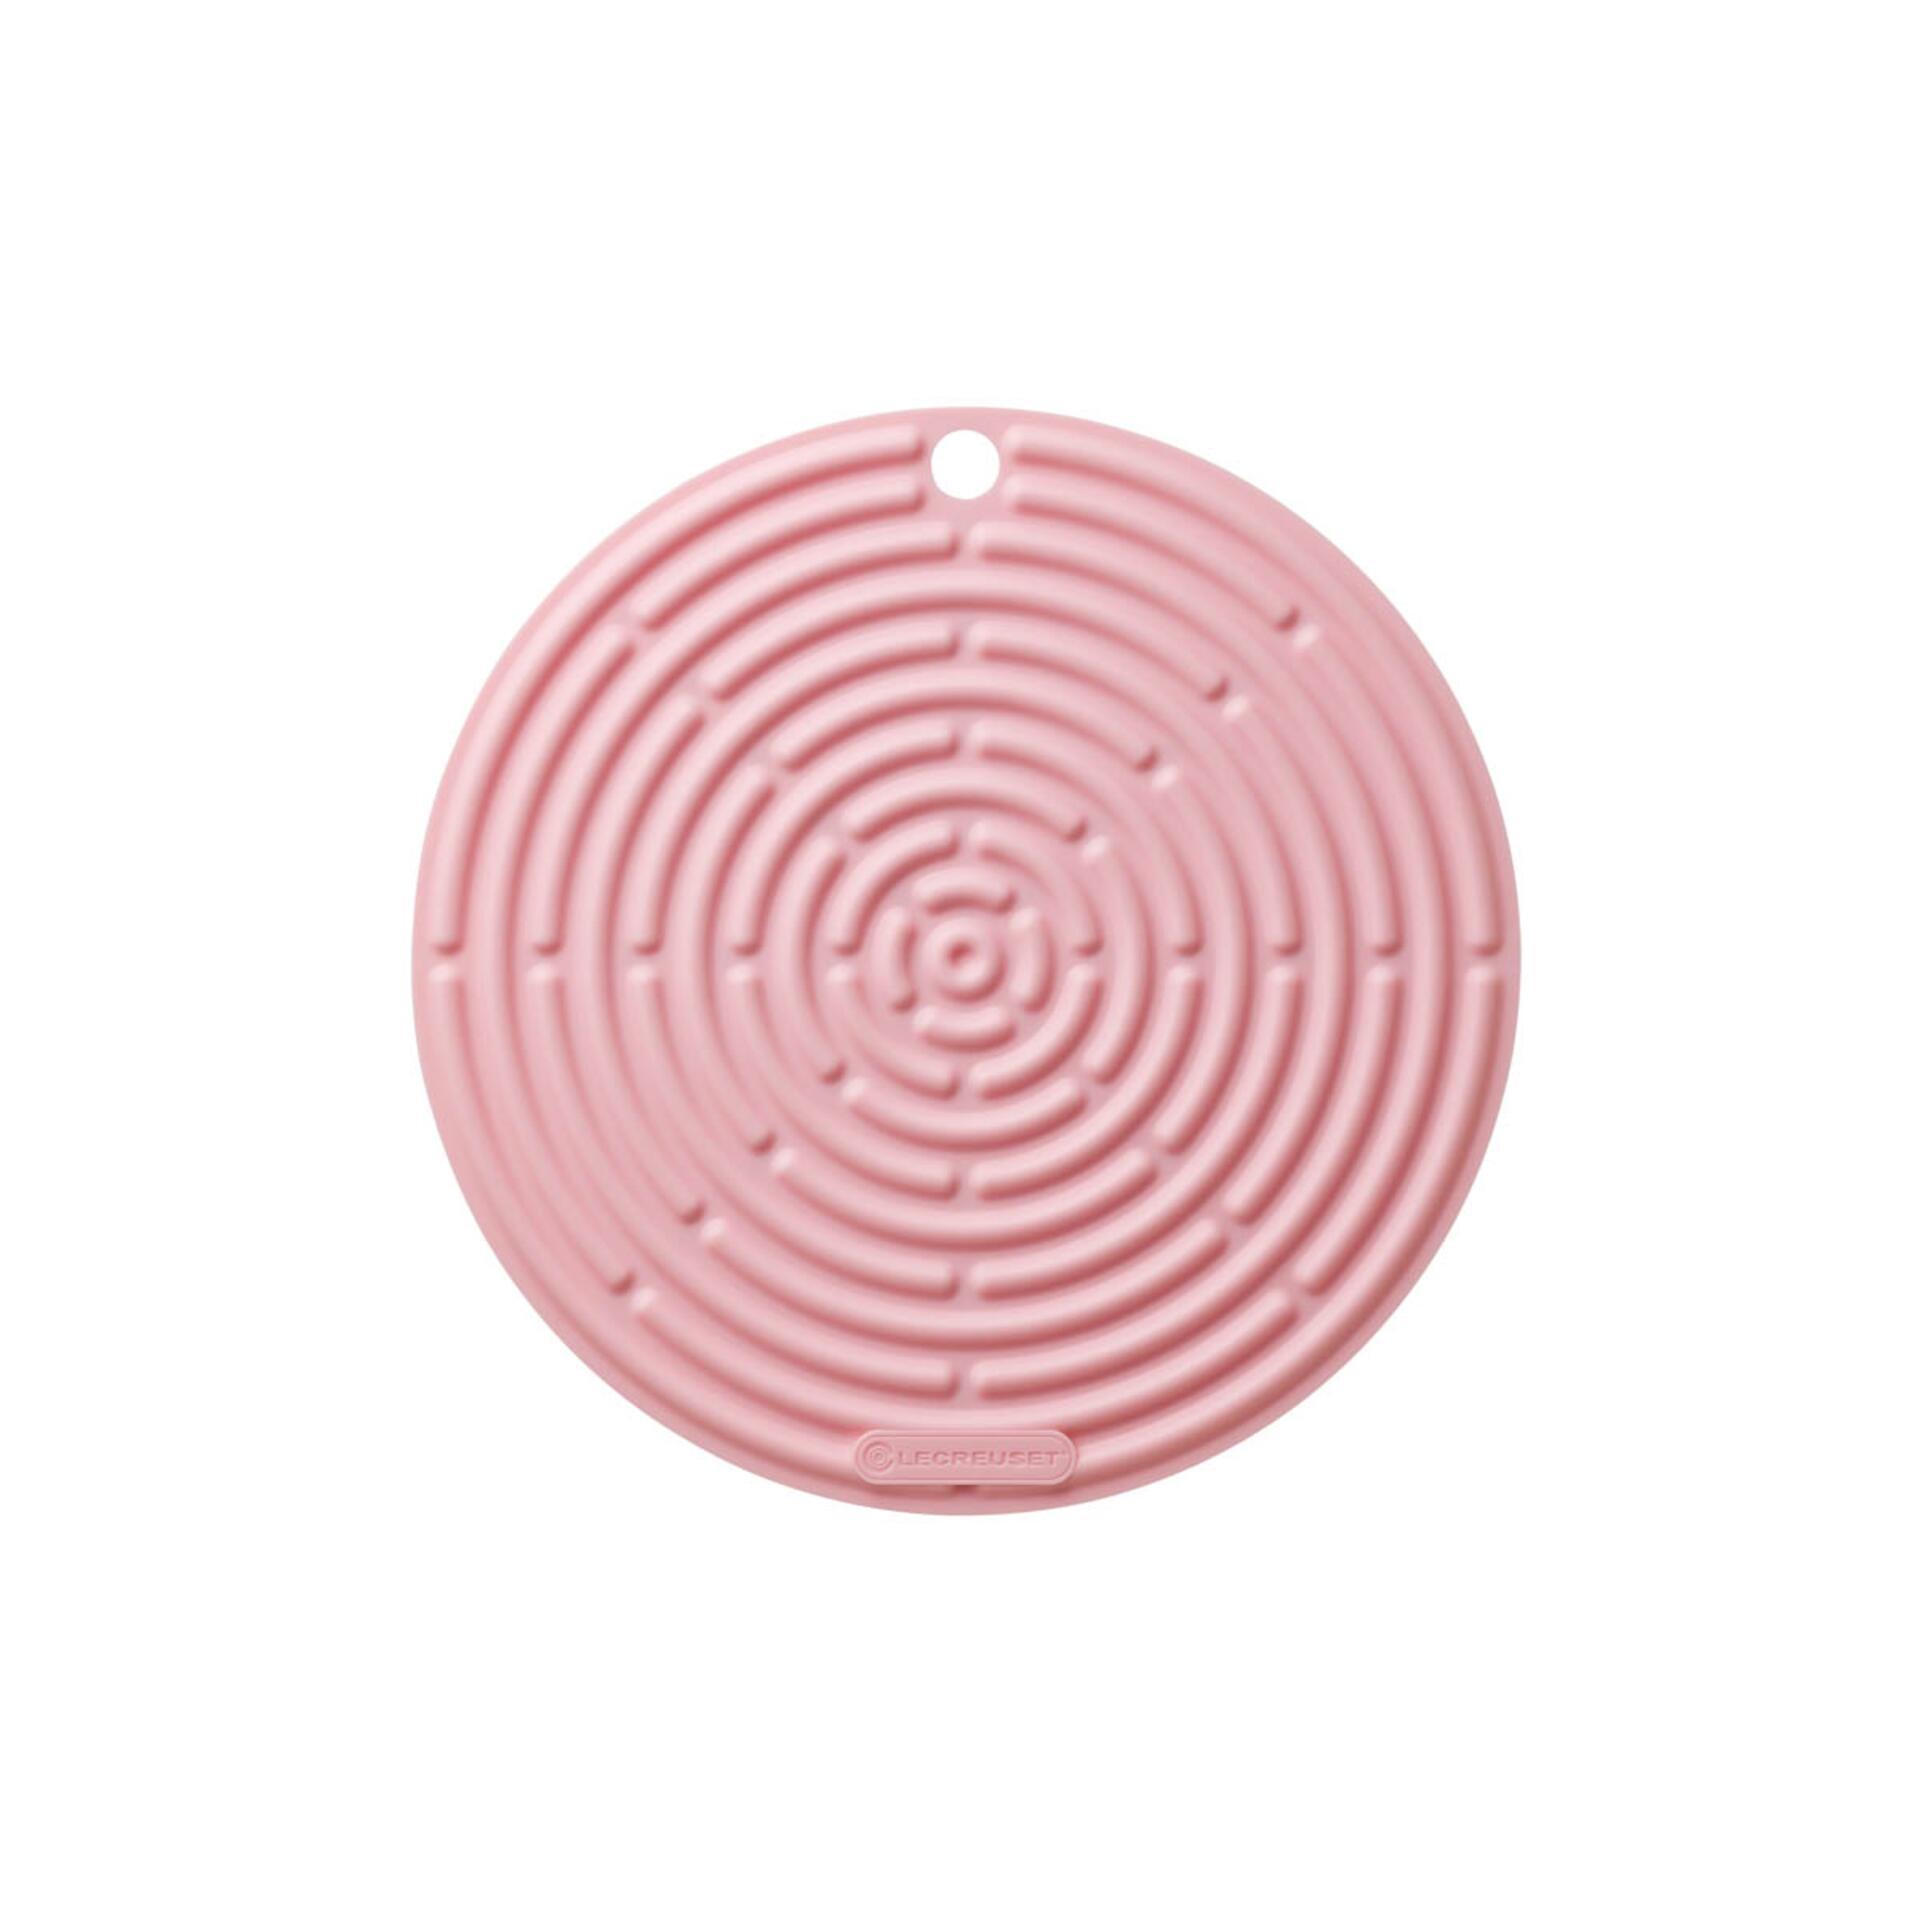 Le Creuset Topflappen Klassik Rund Shell Pink